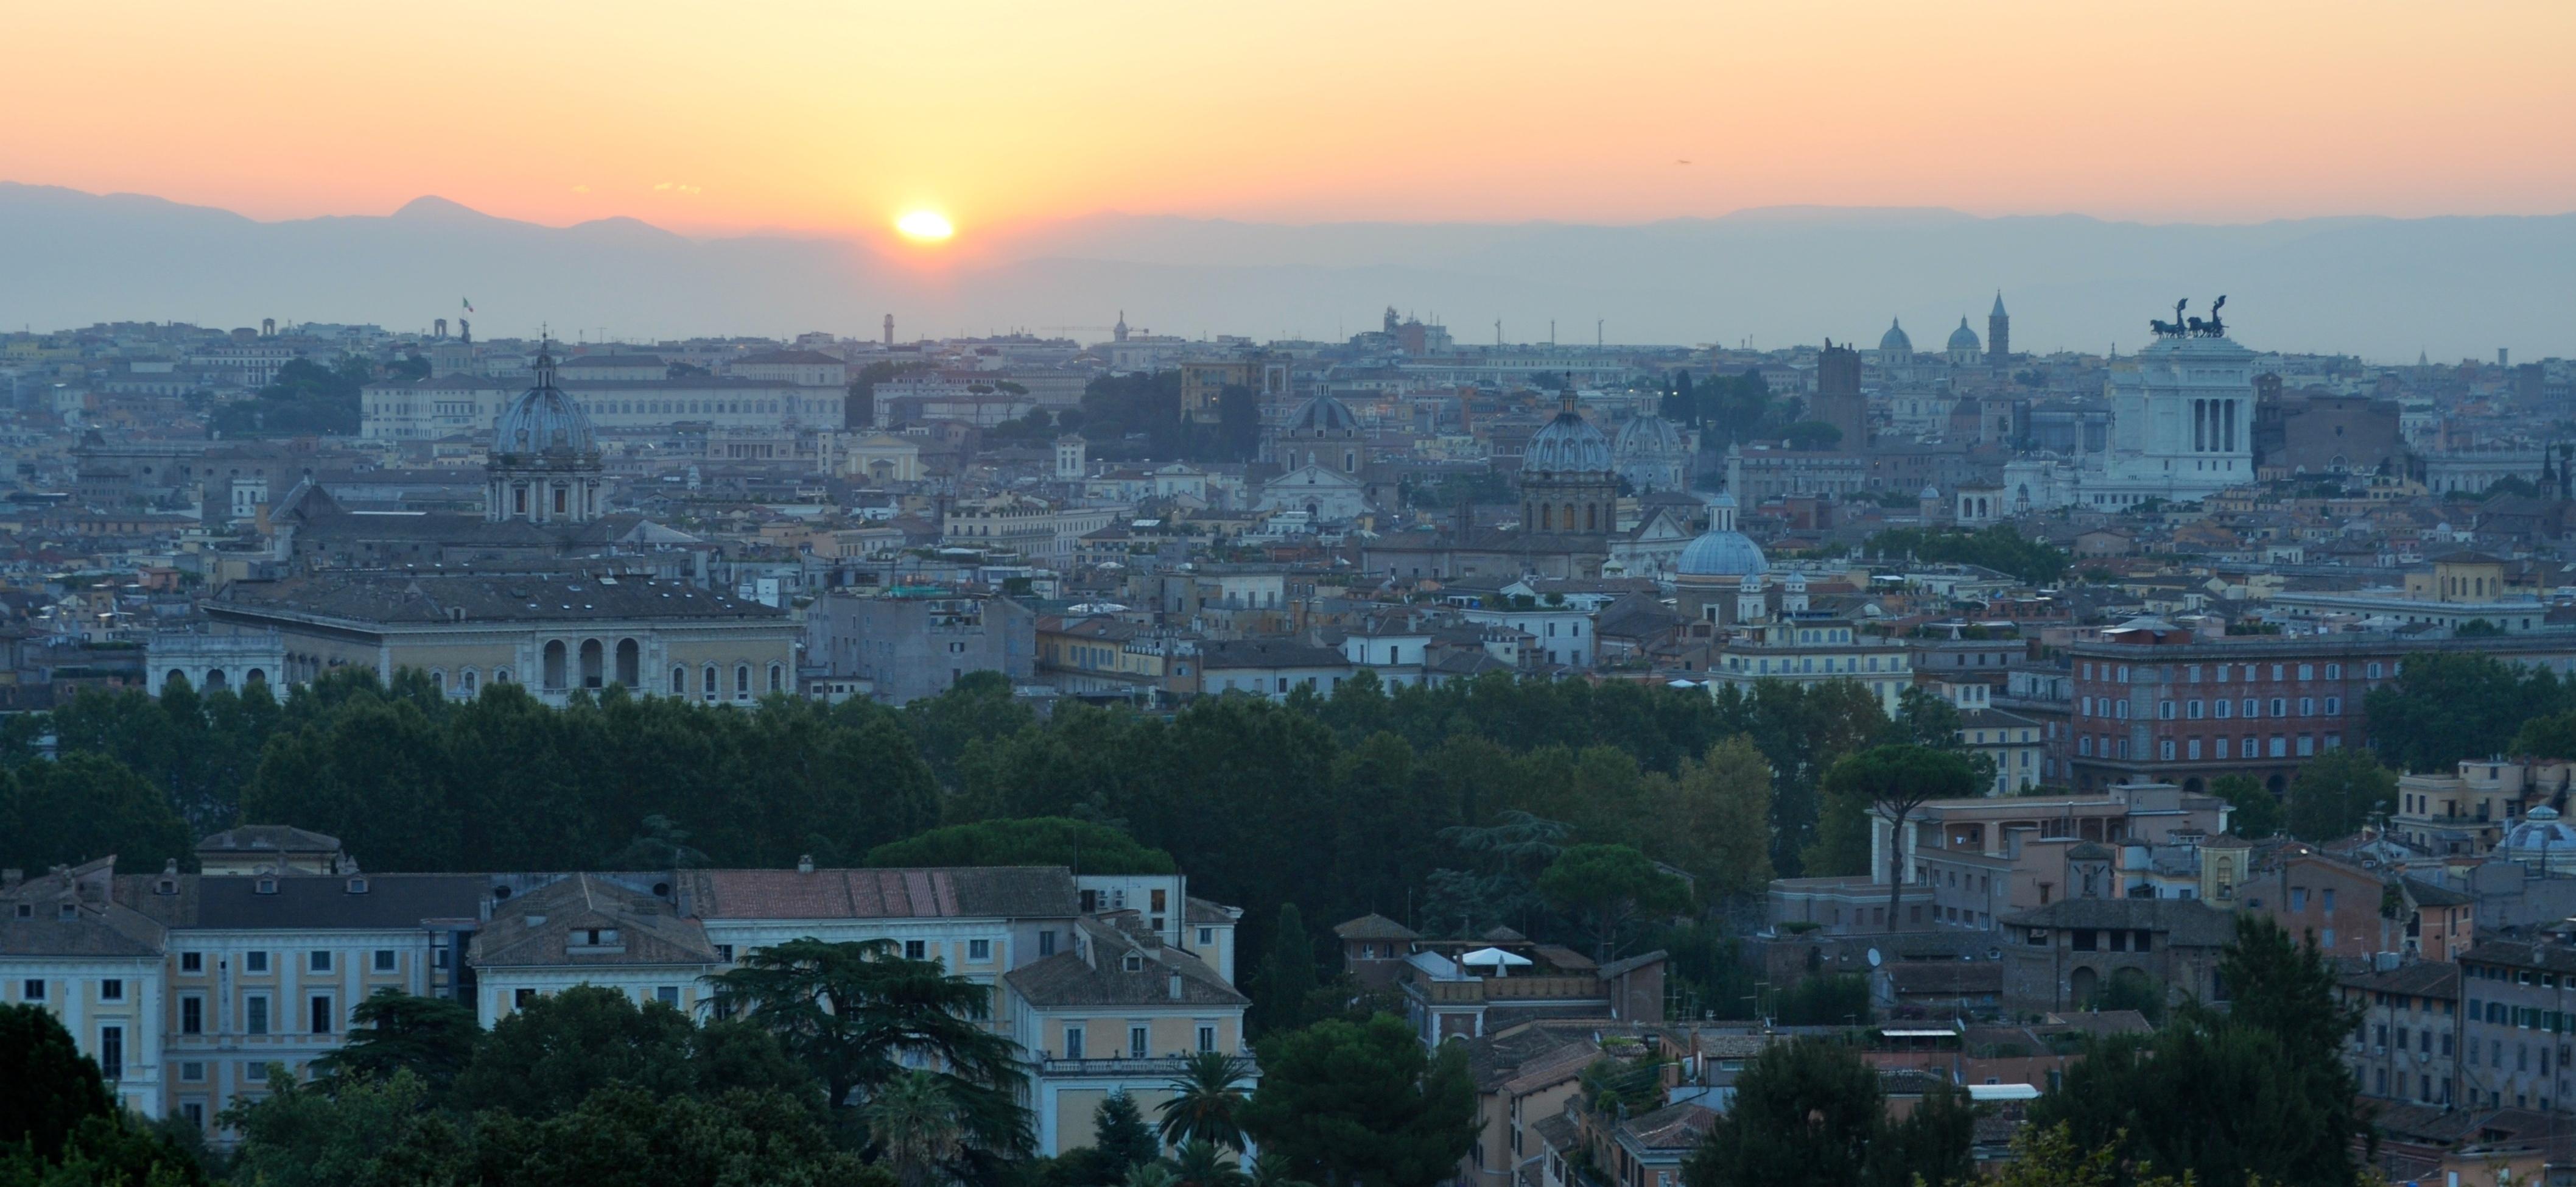 Rome at Sunrise